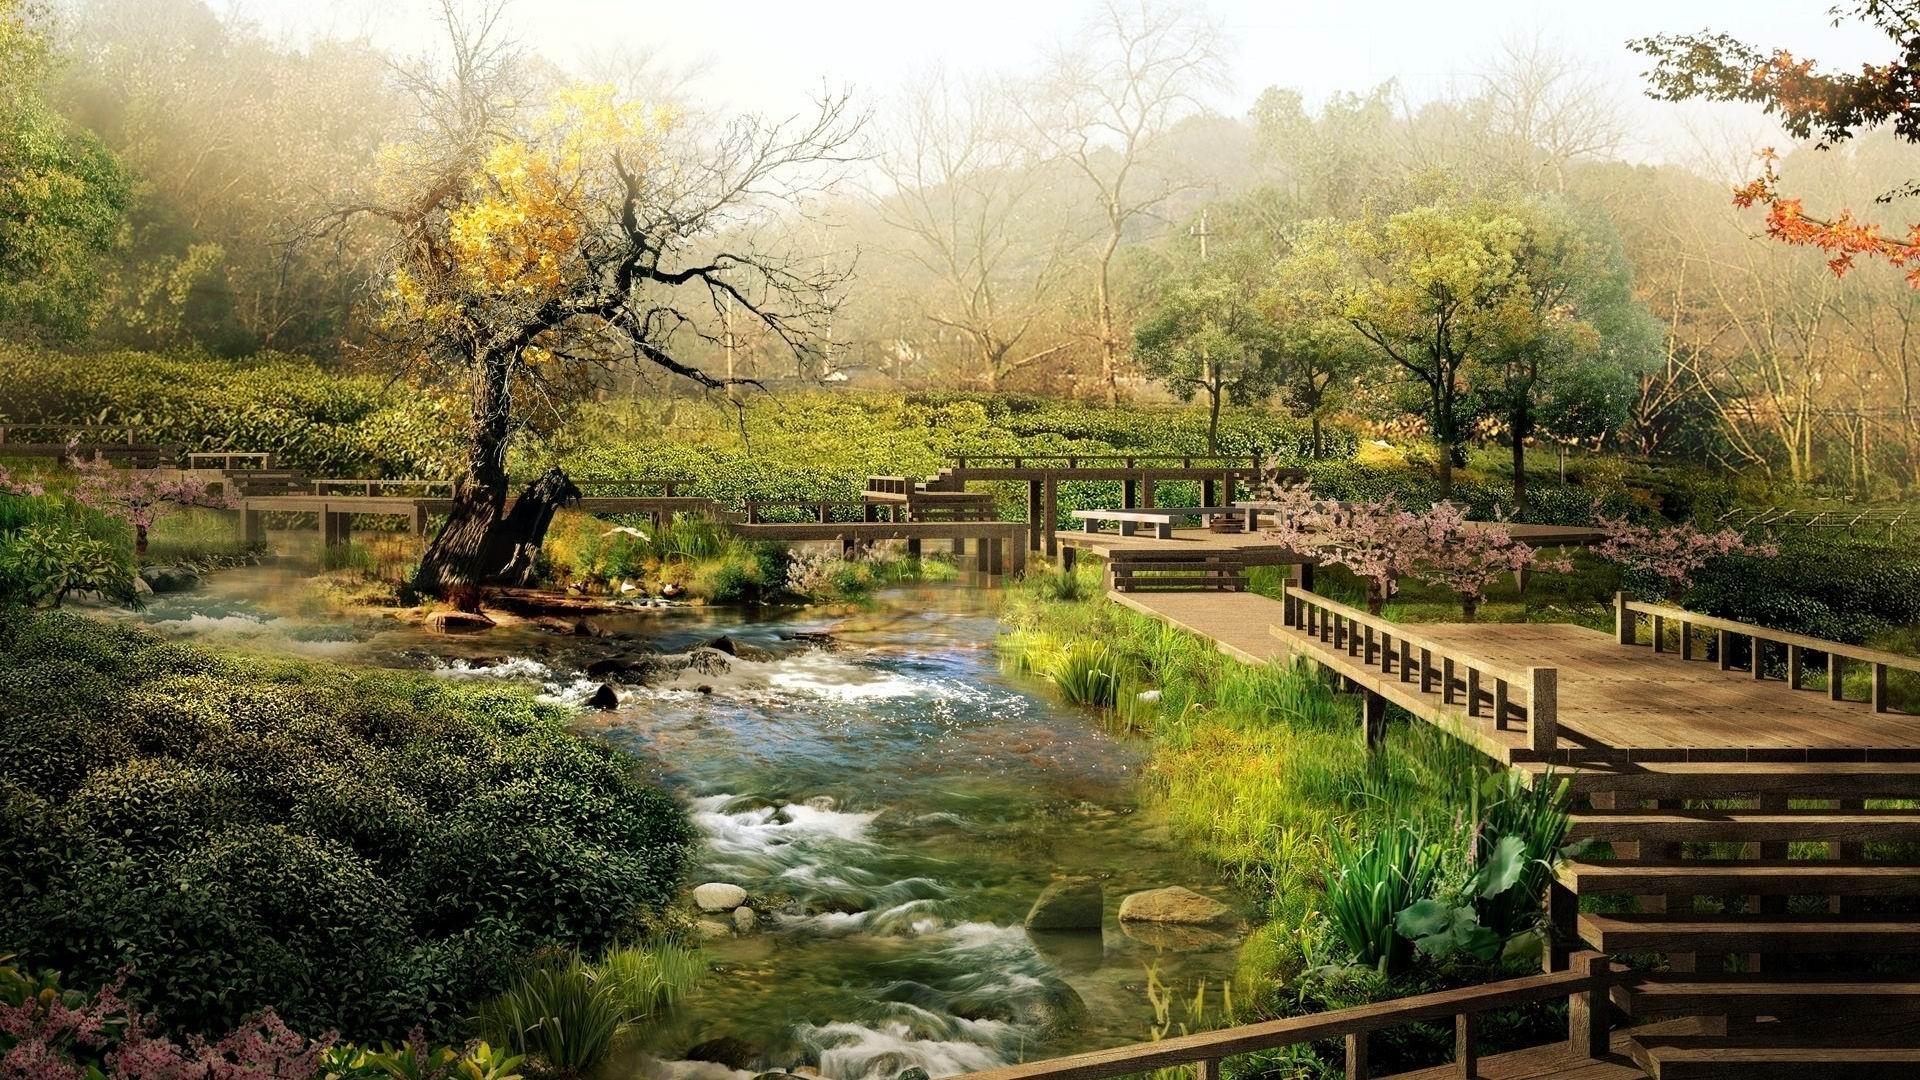 Japón Landscape Nature Photo Wallpaper Avance 10wallpapercom